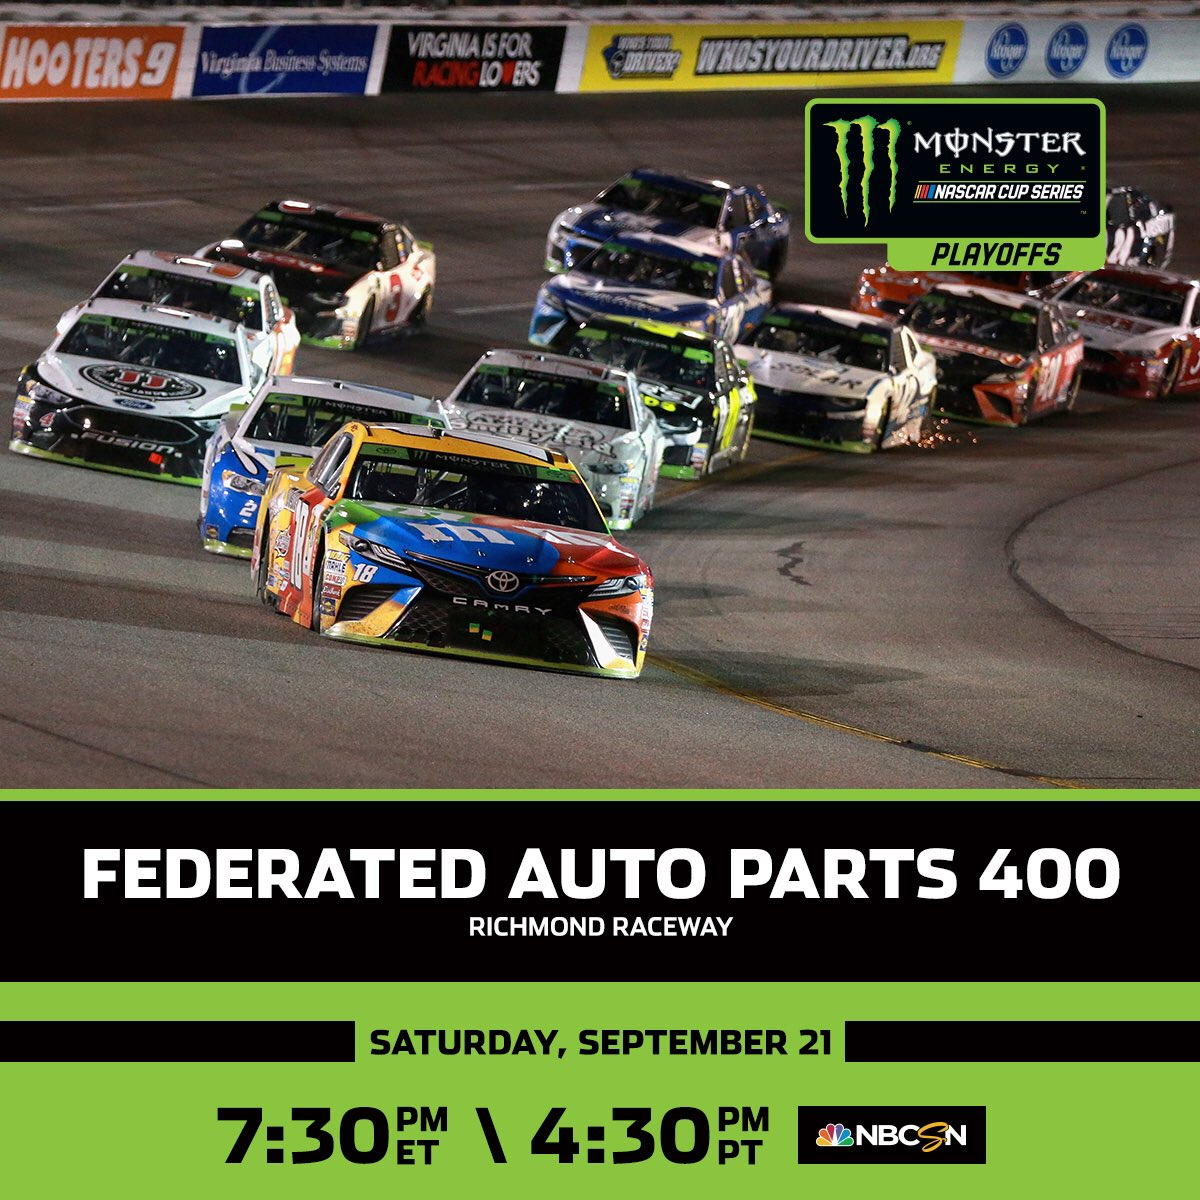 The #NASCARPlayoffs continue tonight under the lights at @RichmondRaceway.